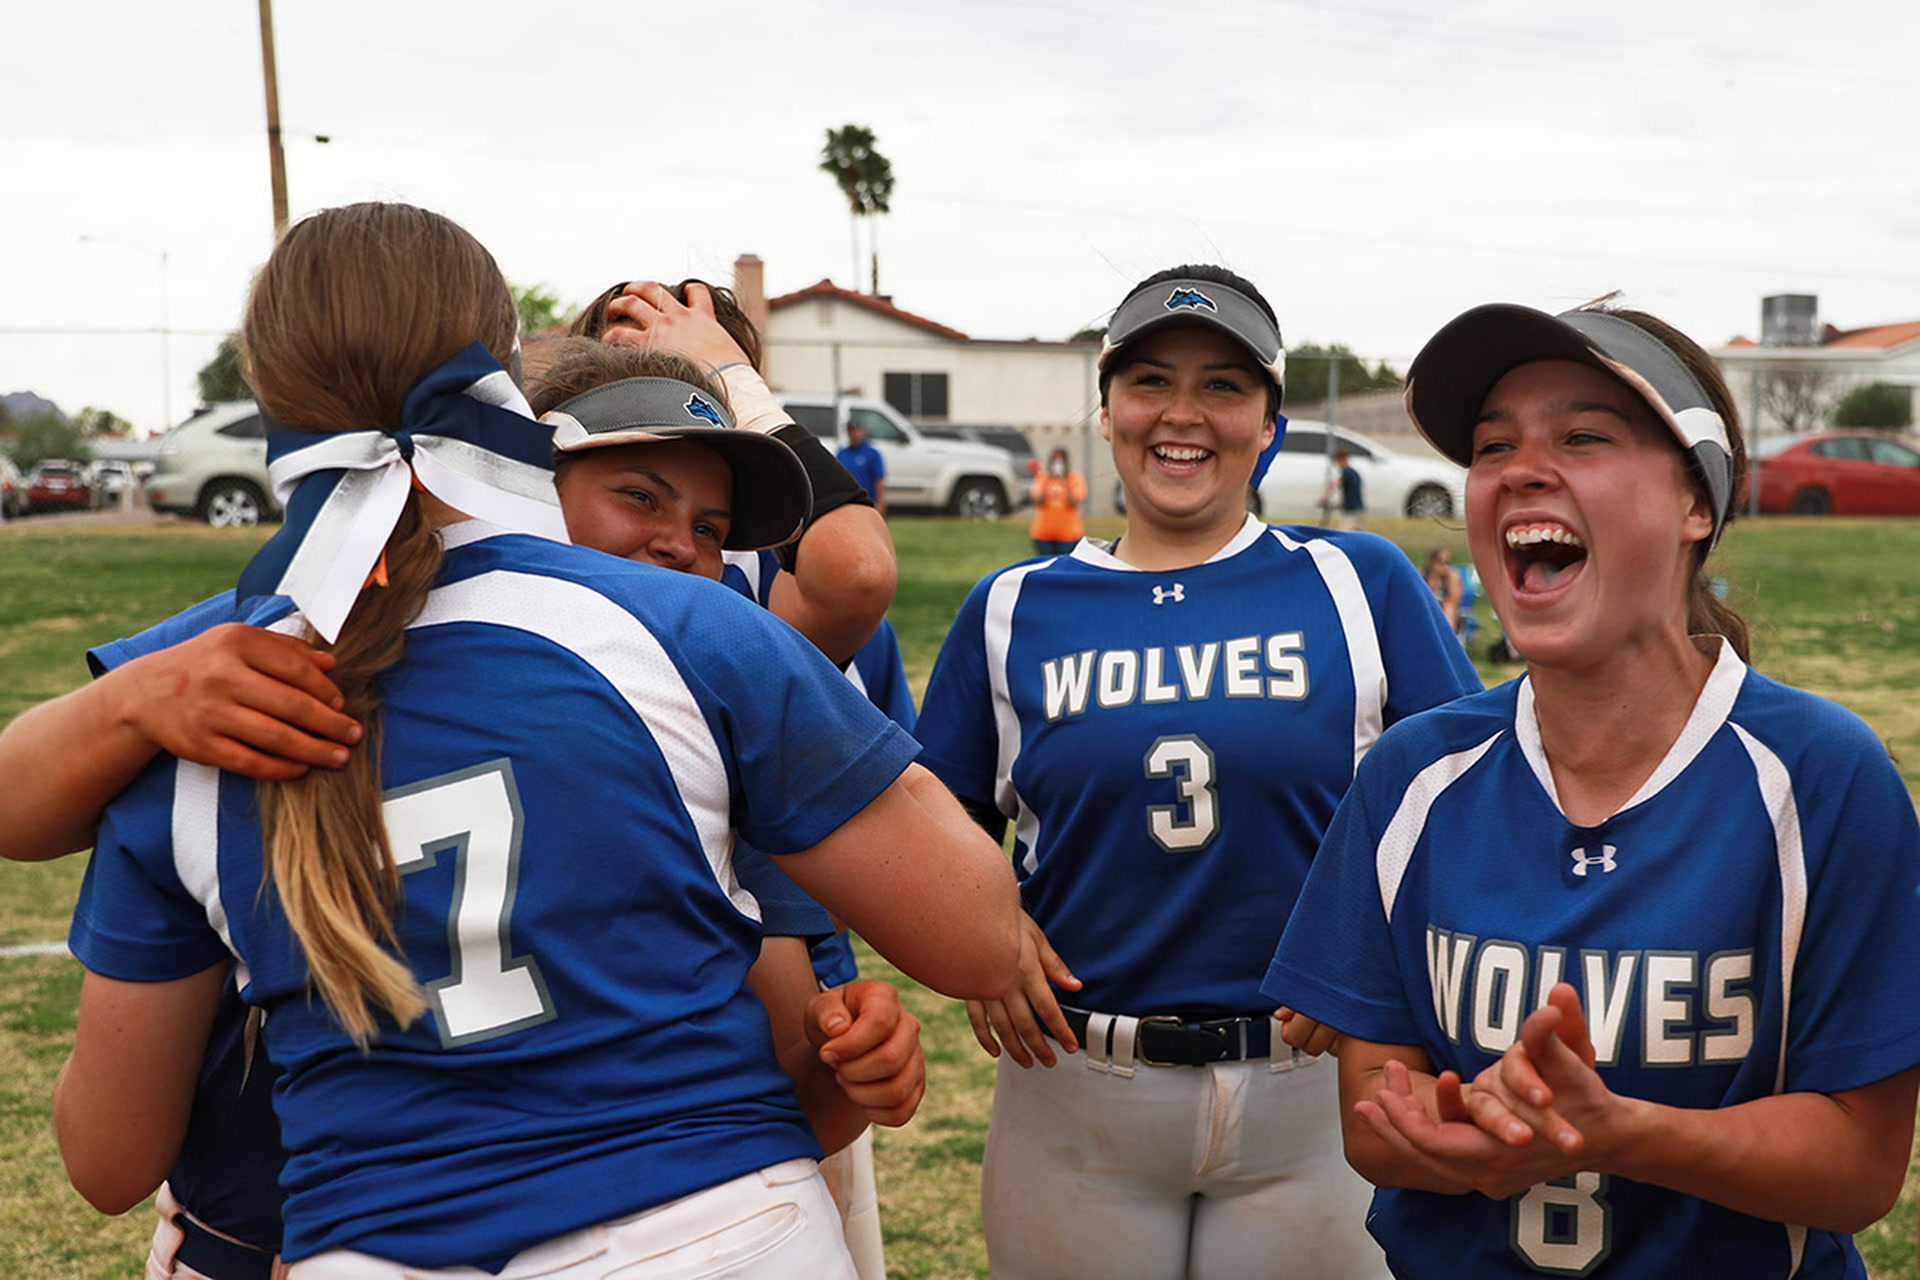 Shelby Basso Mikayla Berg Key Basic Softball Win Over